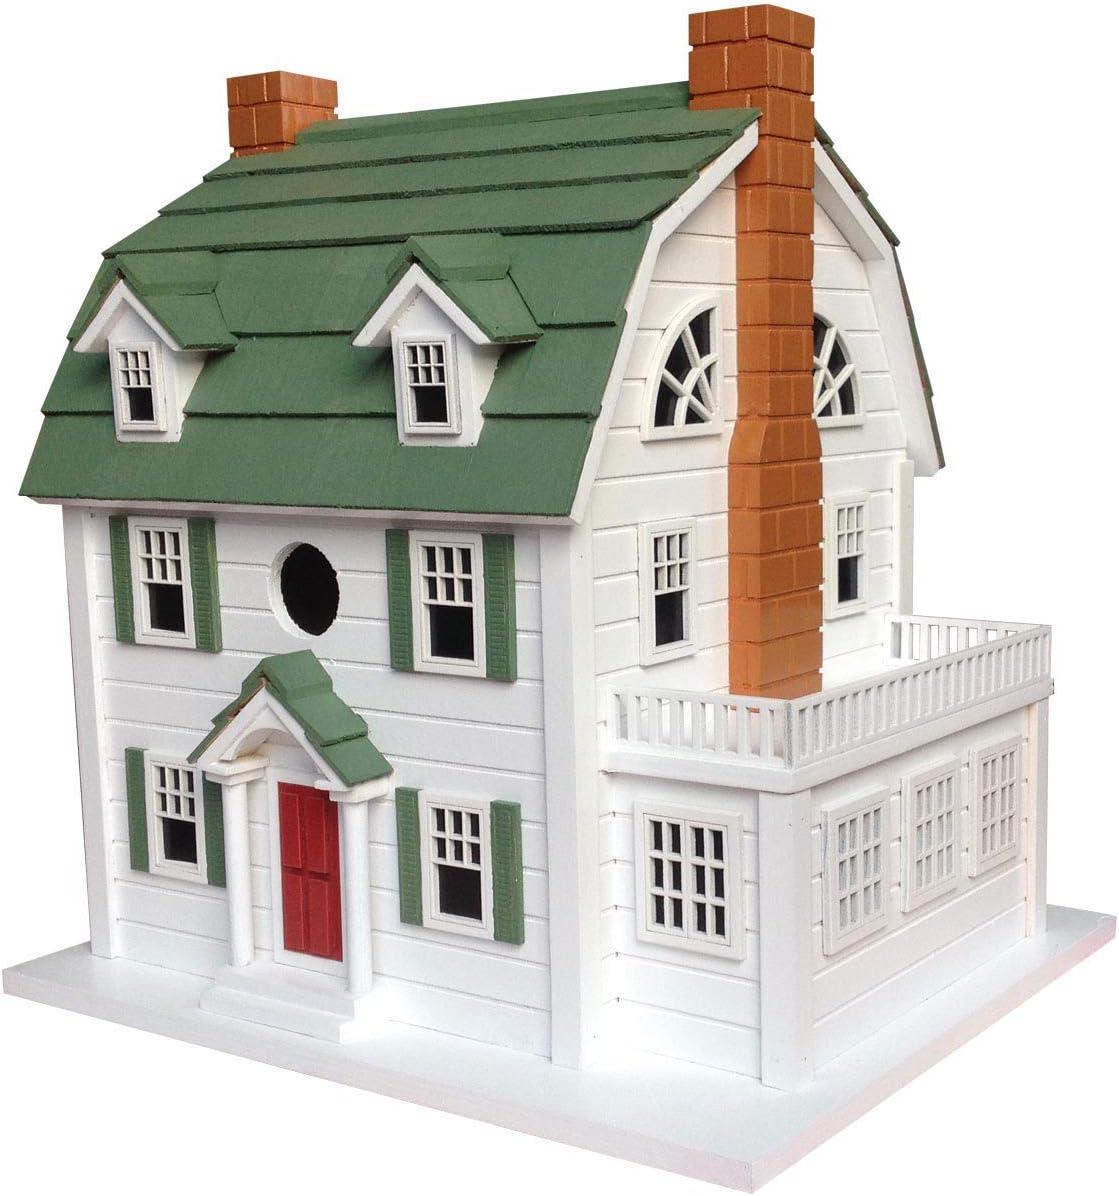 Home Bazaar HB-9509 Dutch Colonial Barn House Decorative Hanging Nest Birdhouse